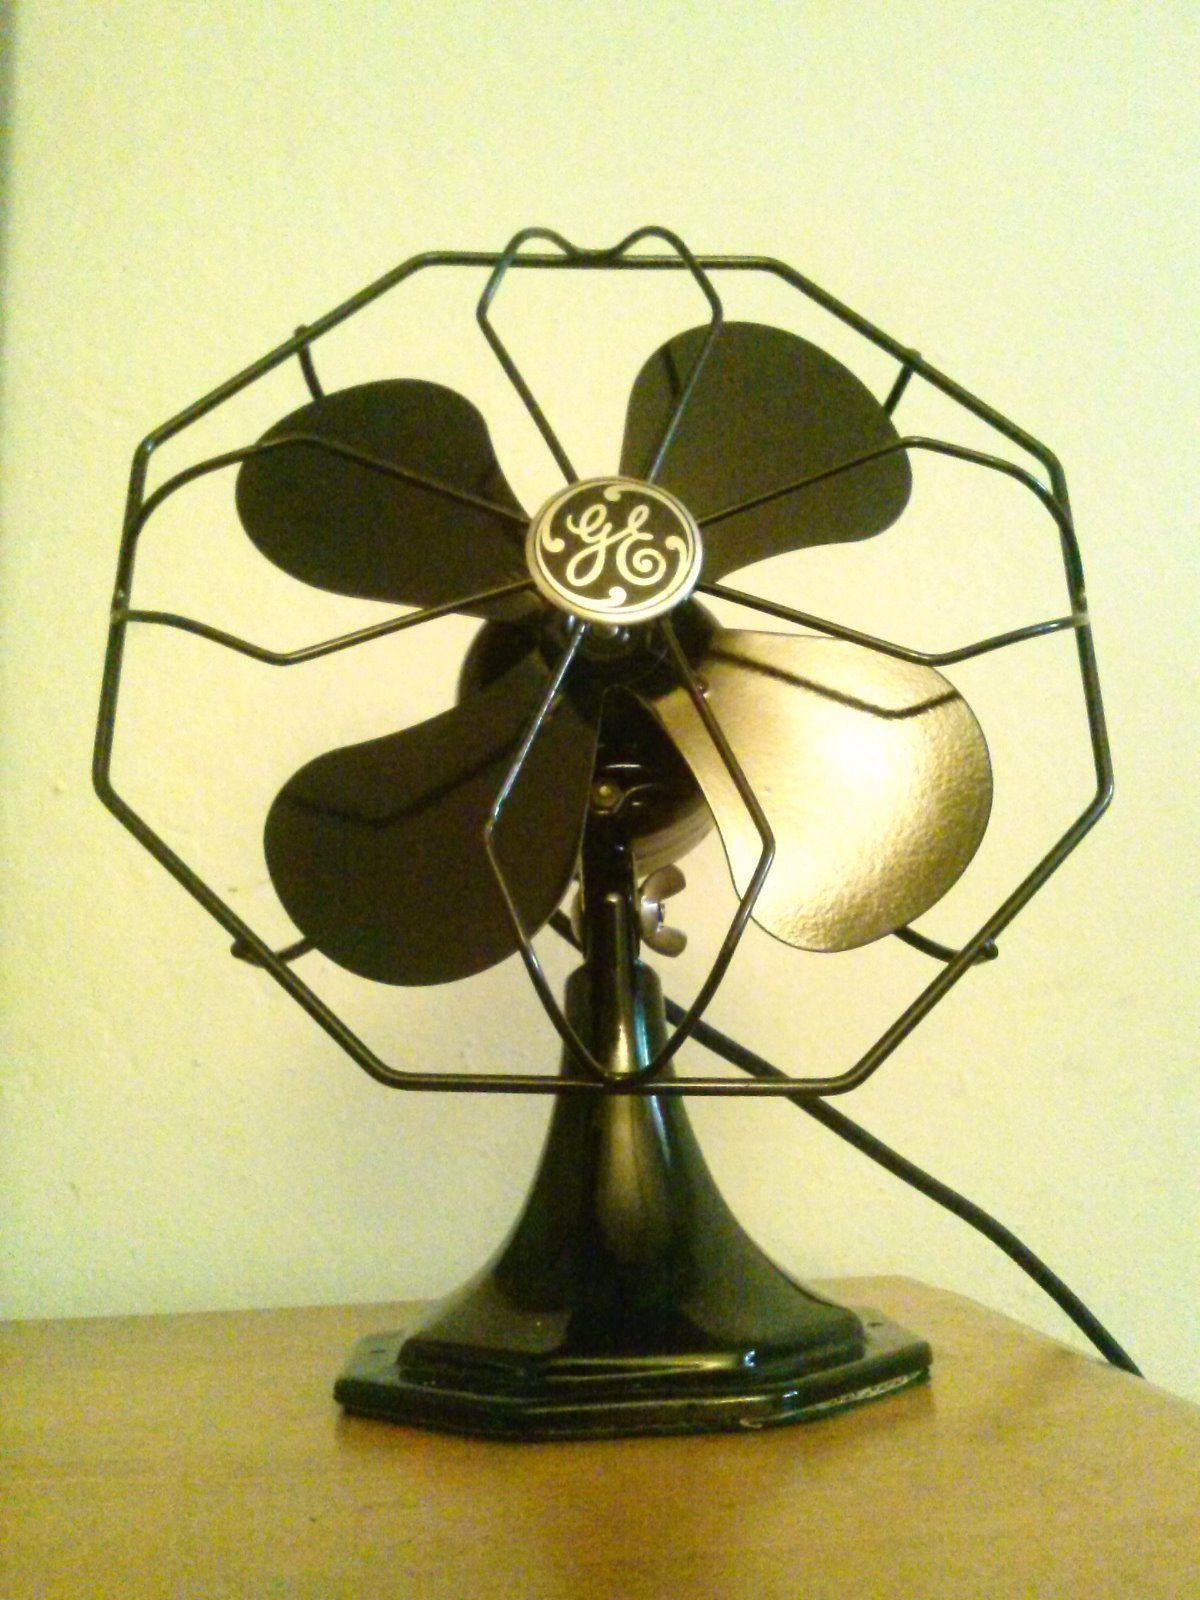 Antique Vintage Deco 30 S 10 Oscillating Electric Fan Professionally Restored 269 00 Antique Fans Vintage Fans Retro Fan